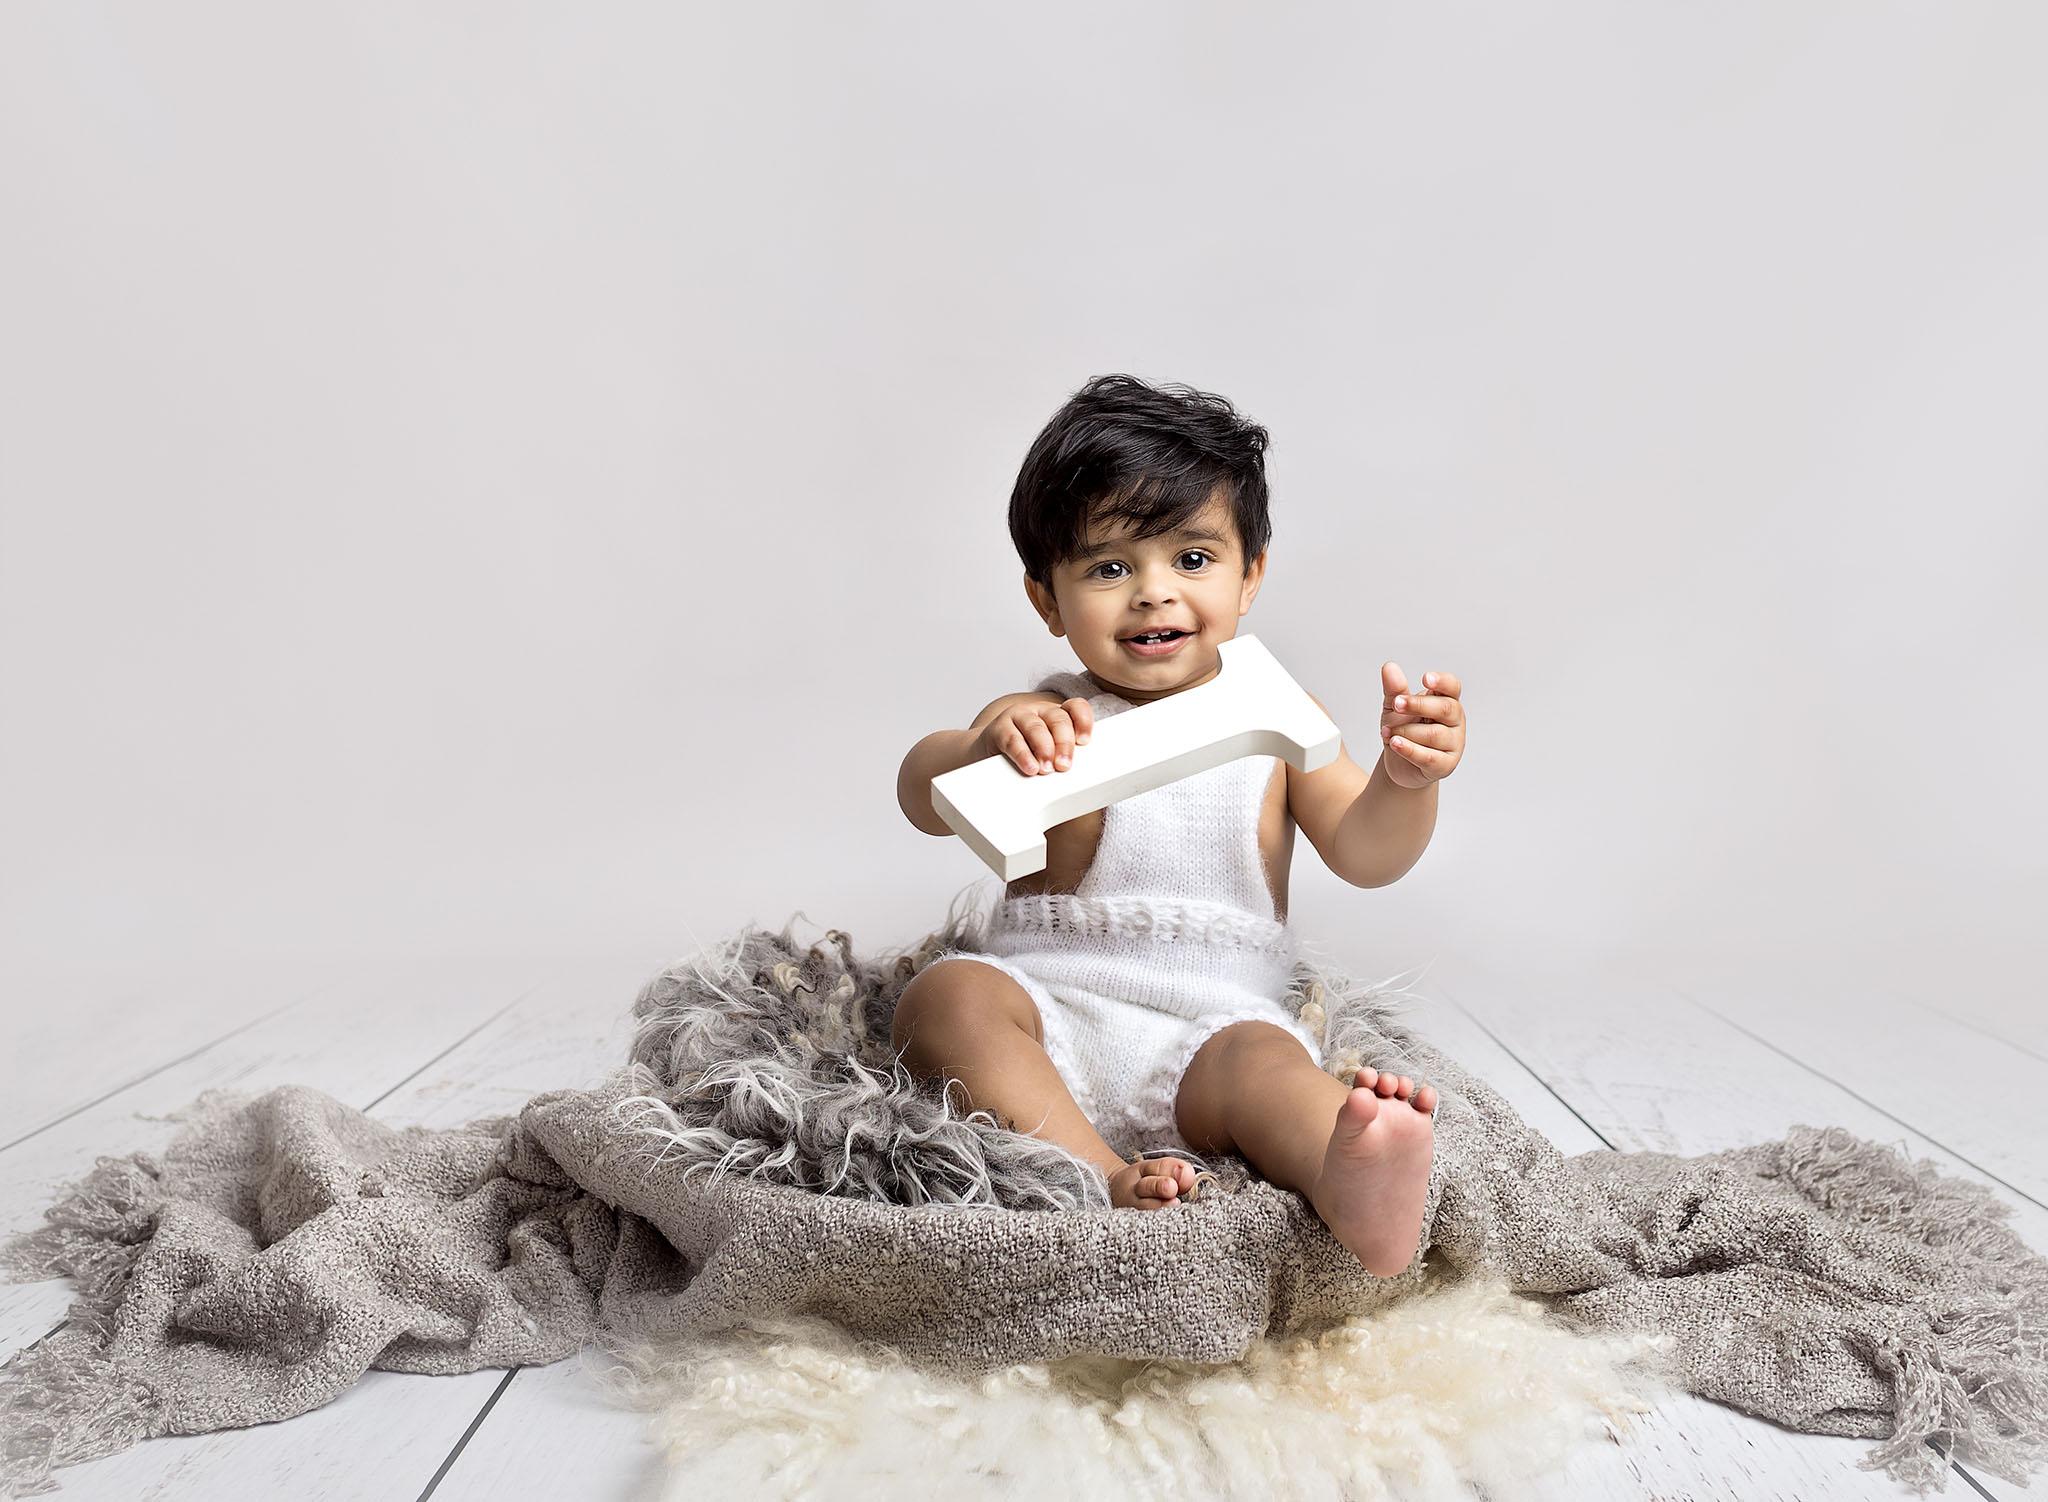 White and grey theme child first Birthday photos